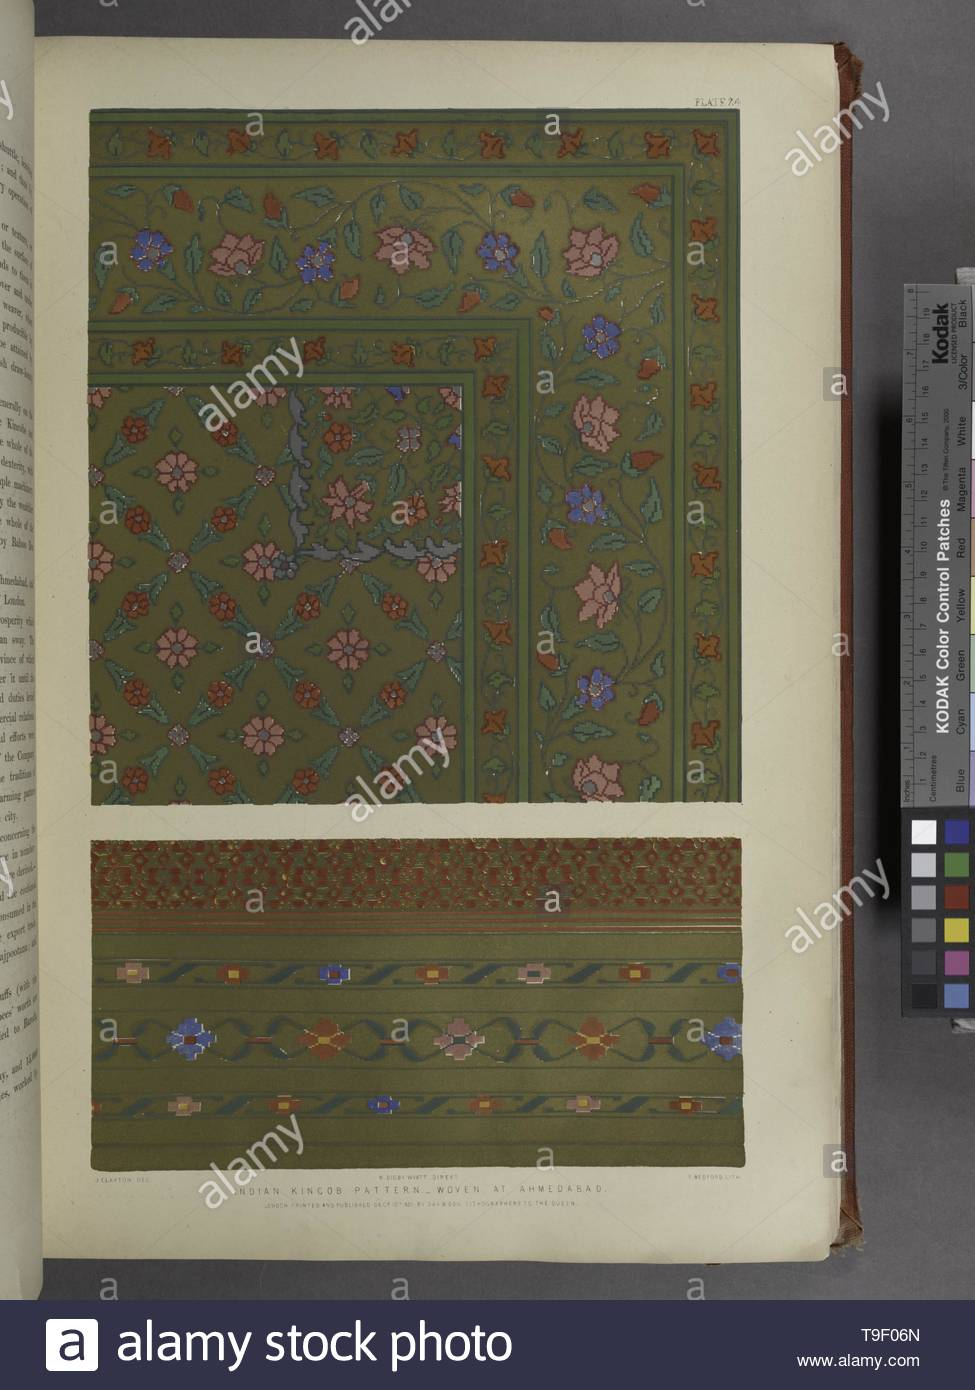 Wyatt,M Digby(MatthewDigby),Sir,1820-1877-Indian kincob pattern - woven at Ahmedabad - Stock Image